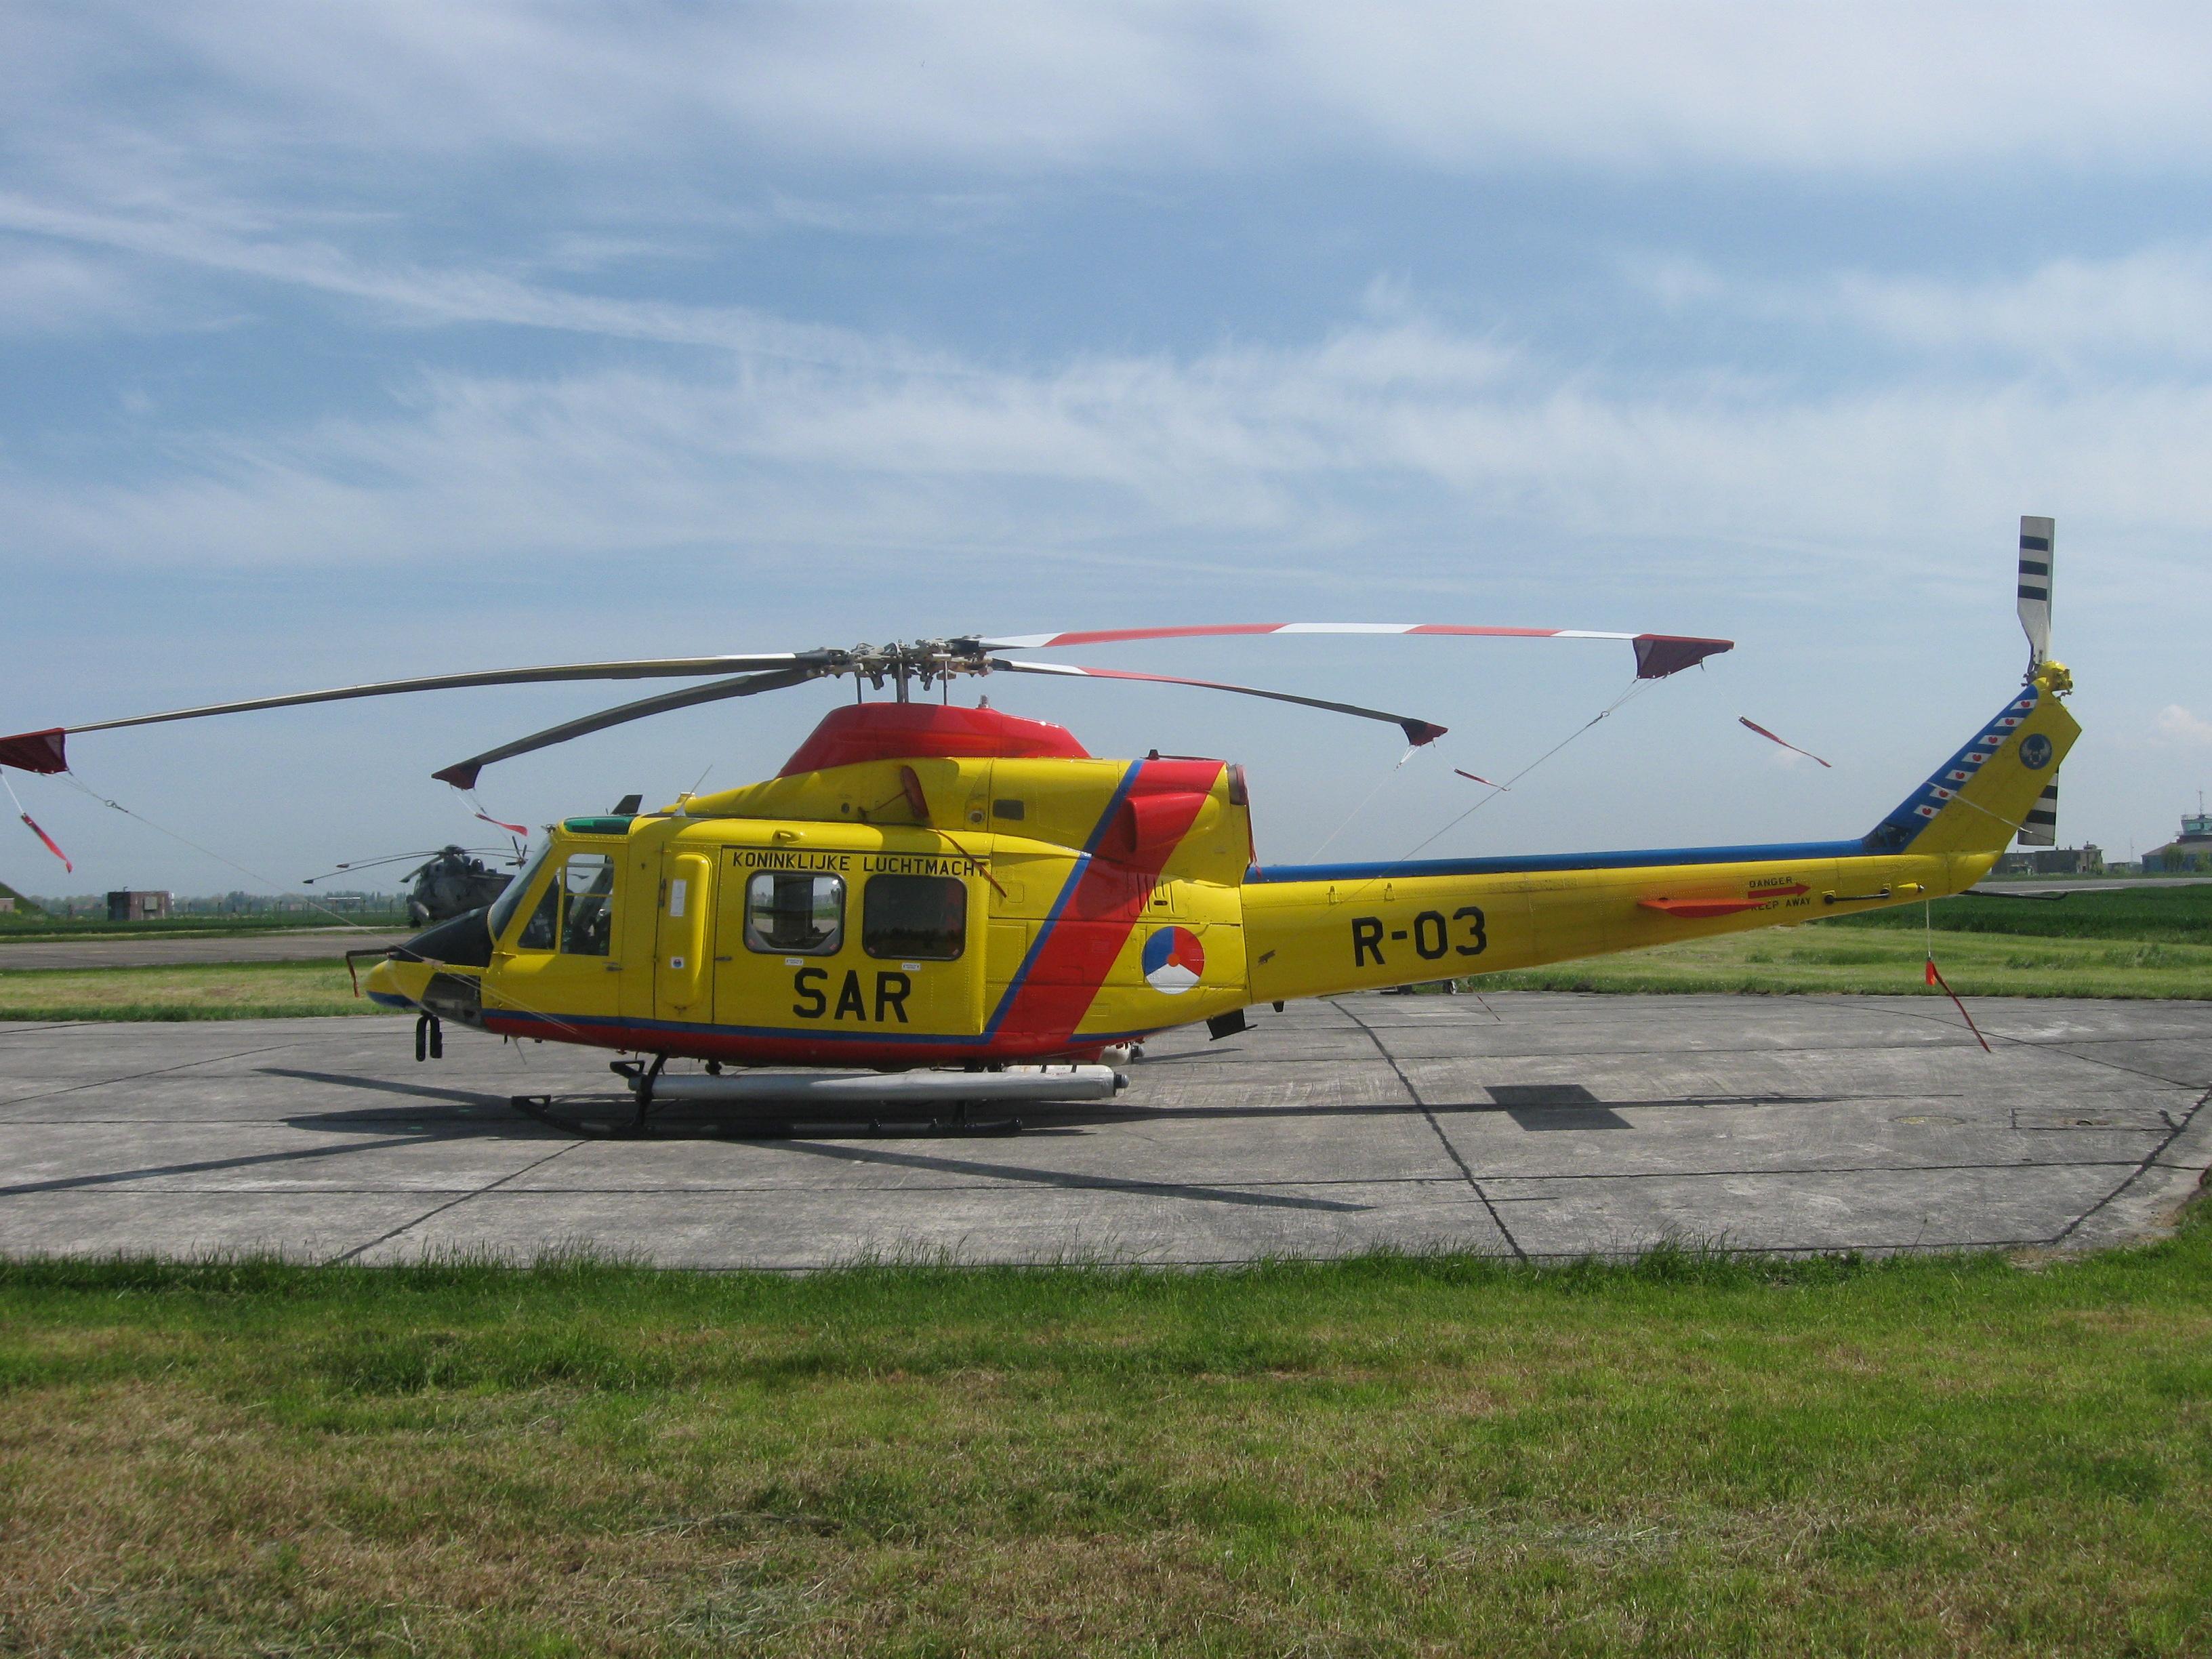 Helico's : divers, photos, infos 1005180812001050246058950